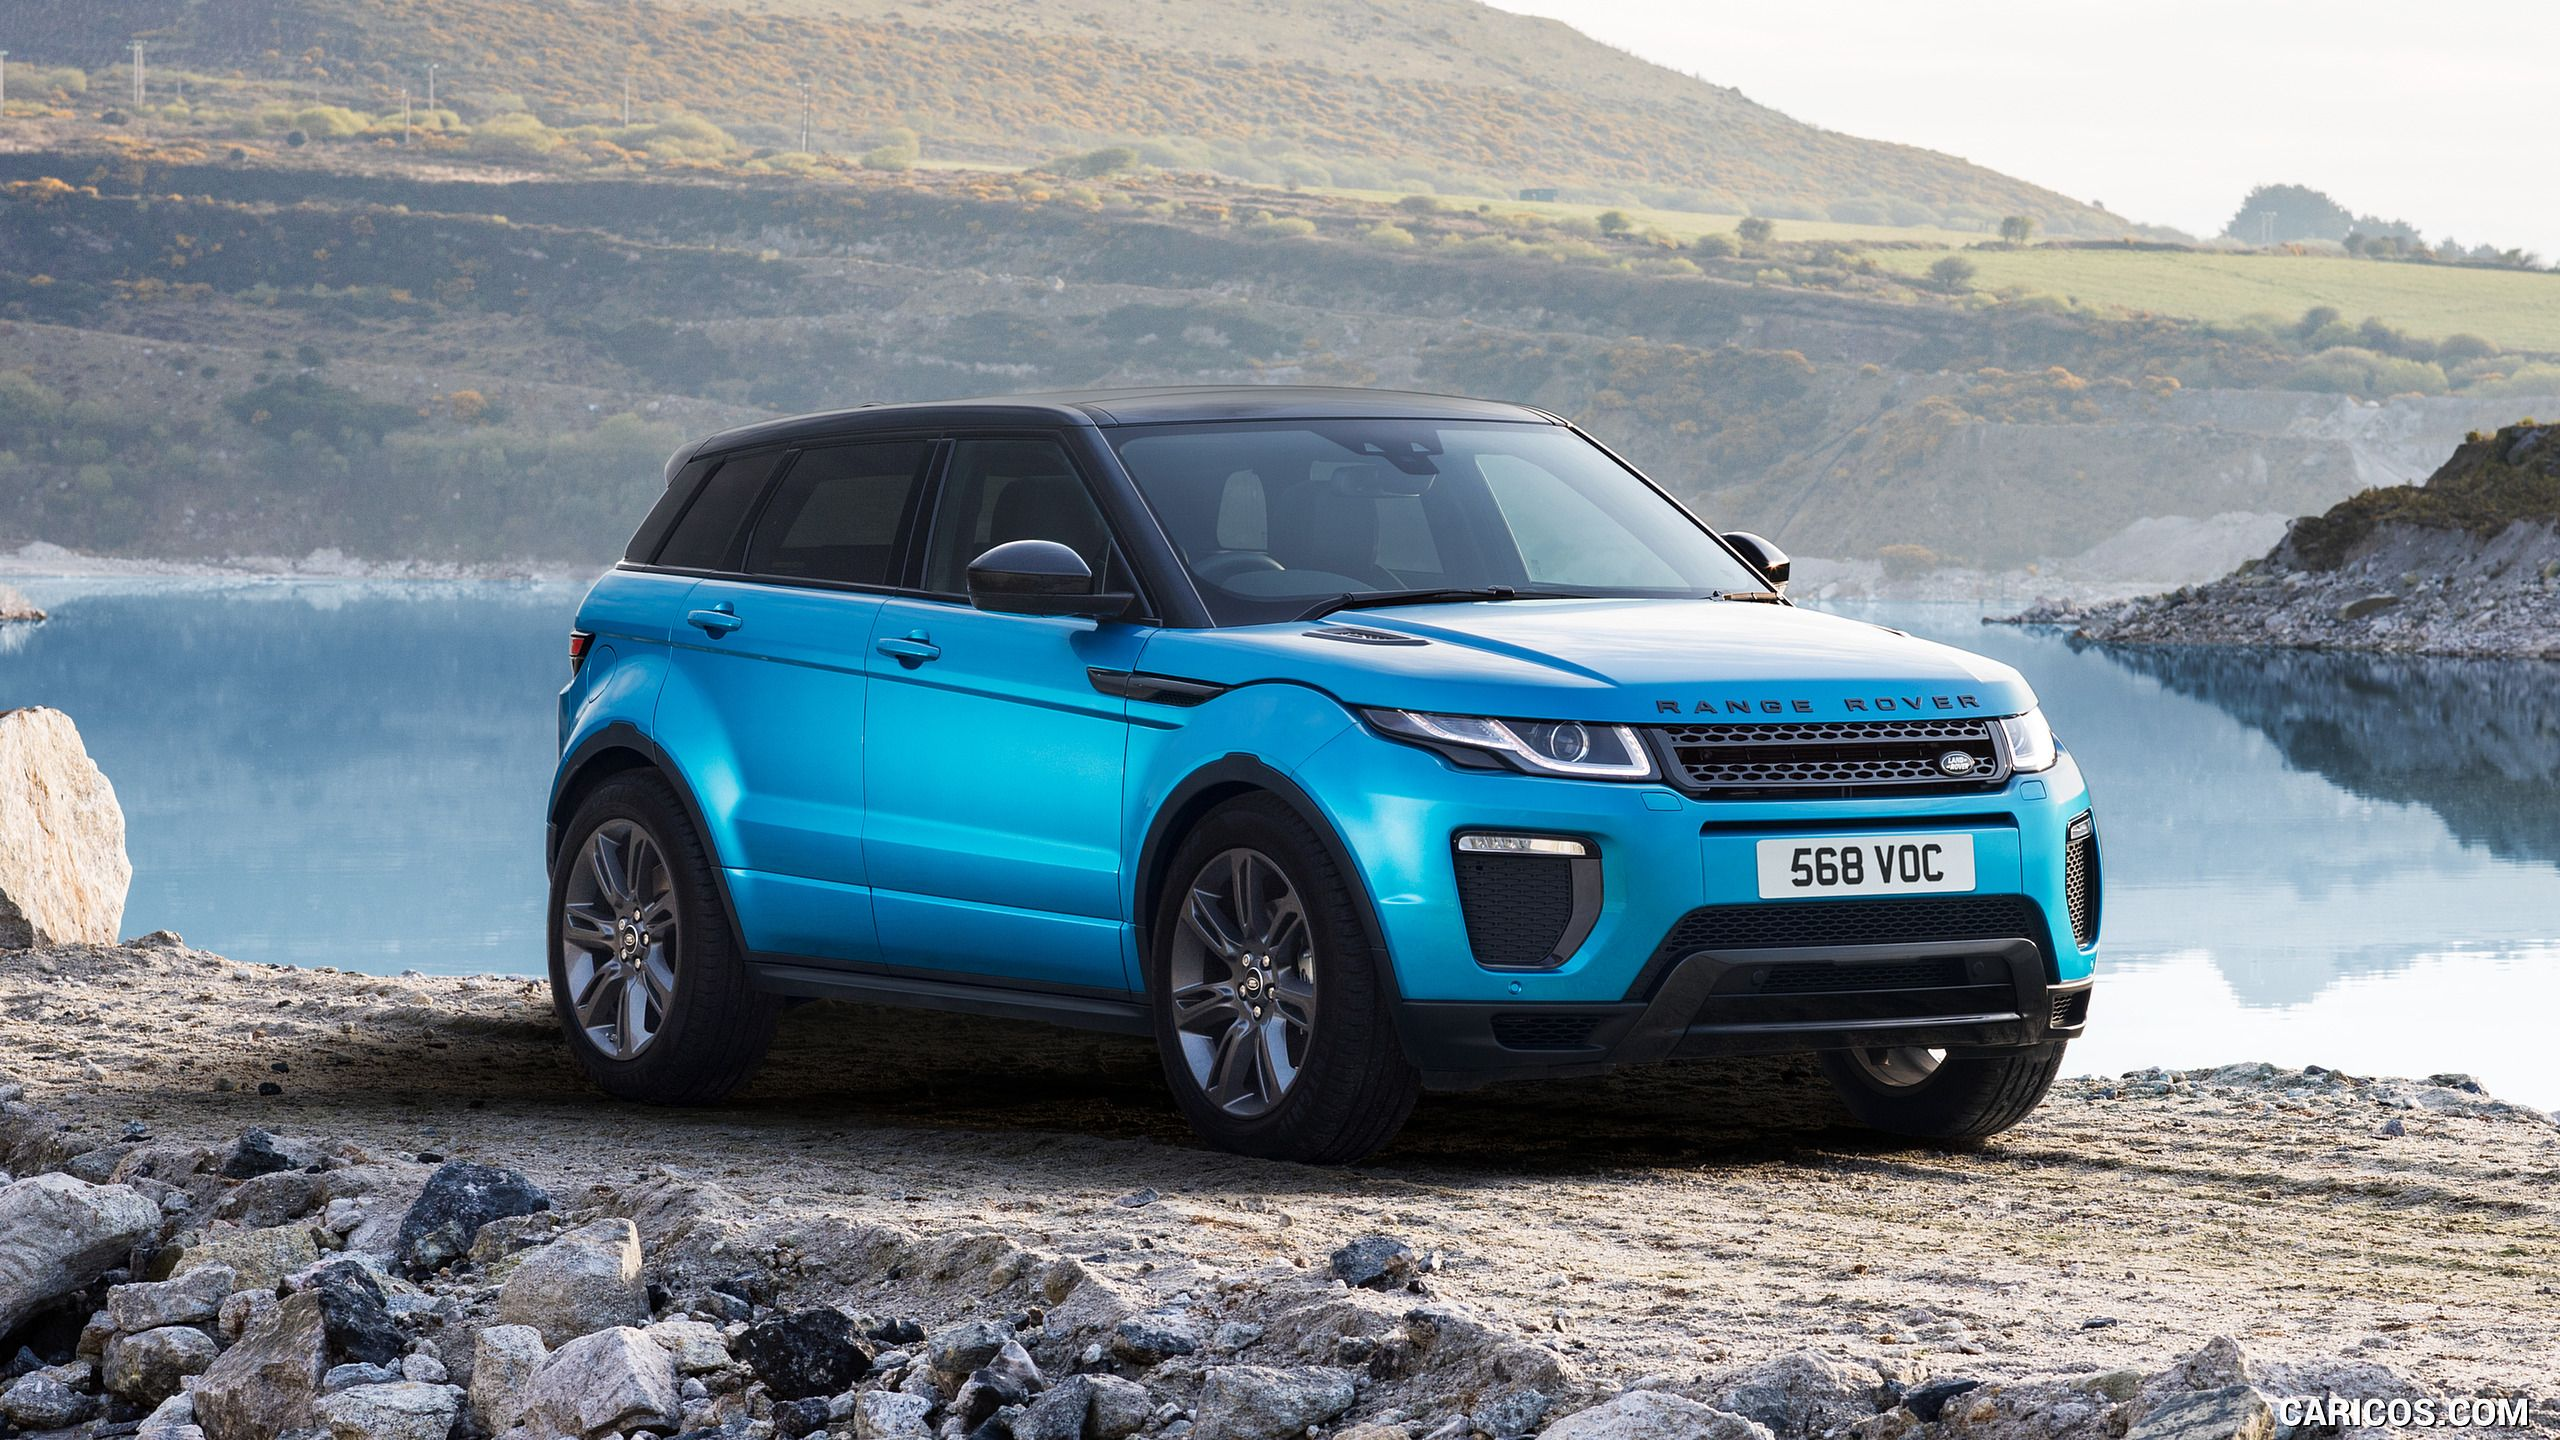 2018 Range Rover Evoque Landmark Special Edition